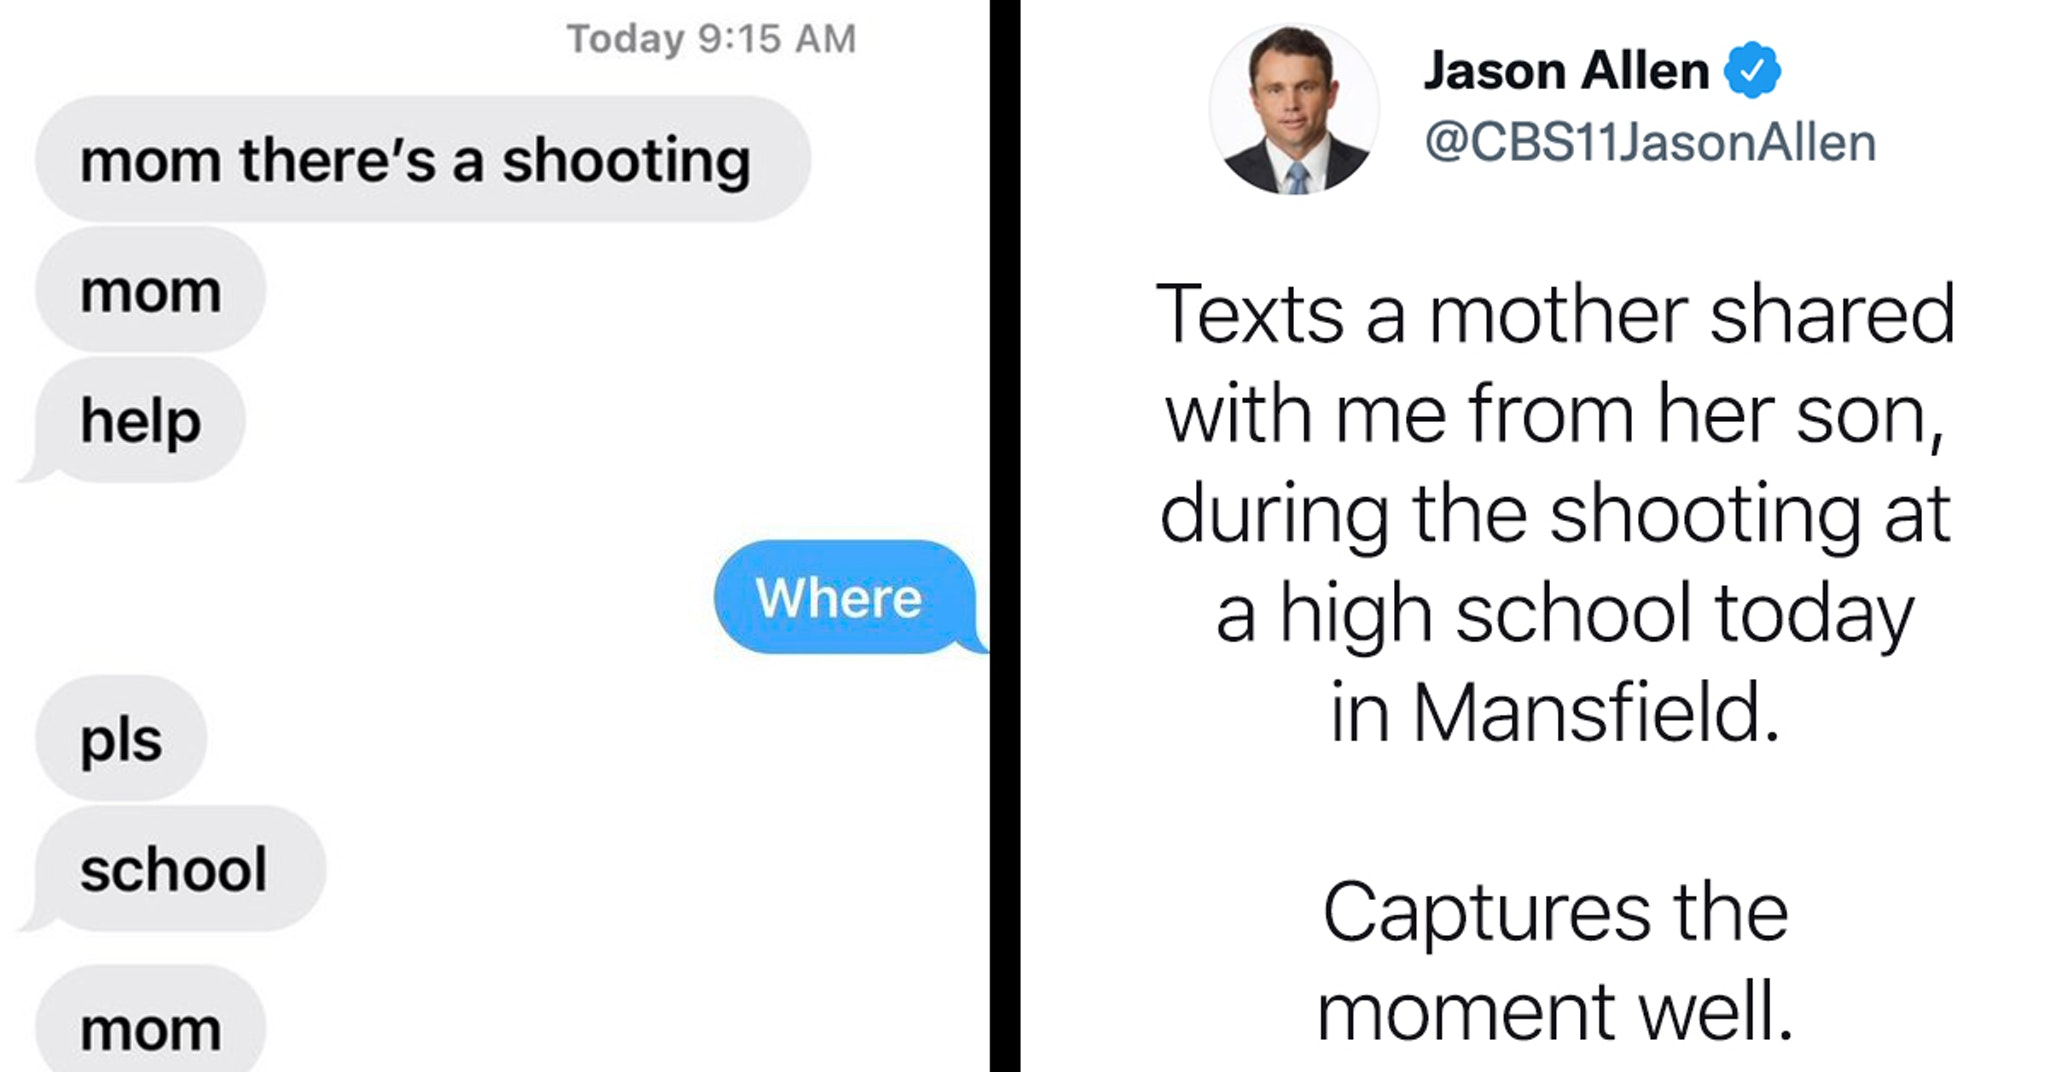 school-shooting-text-